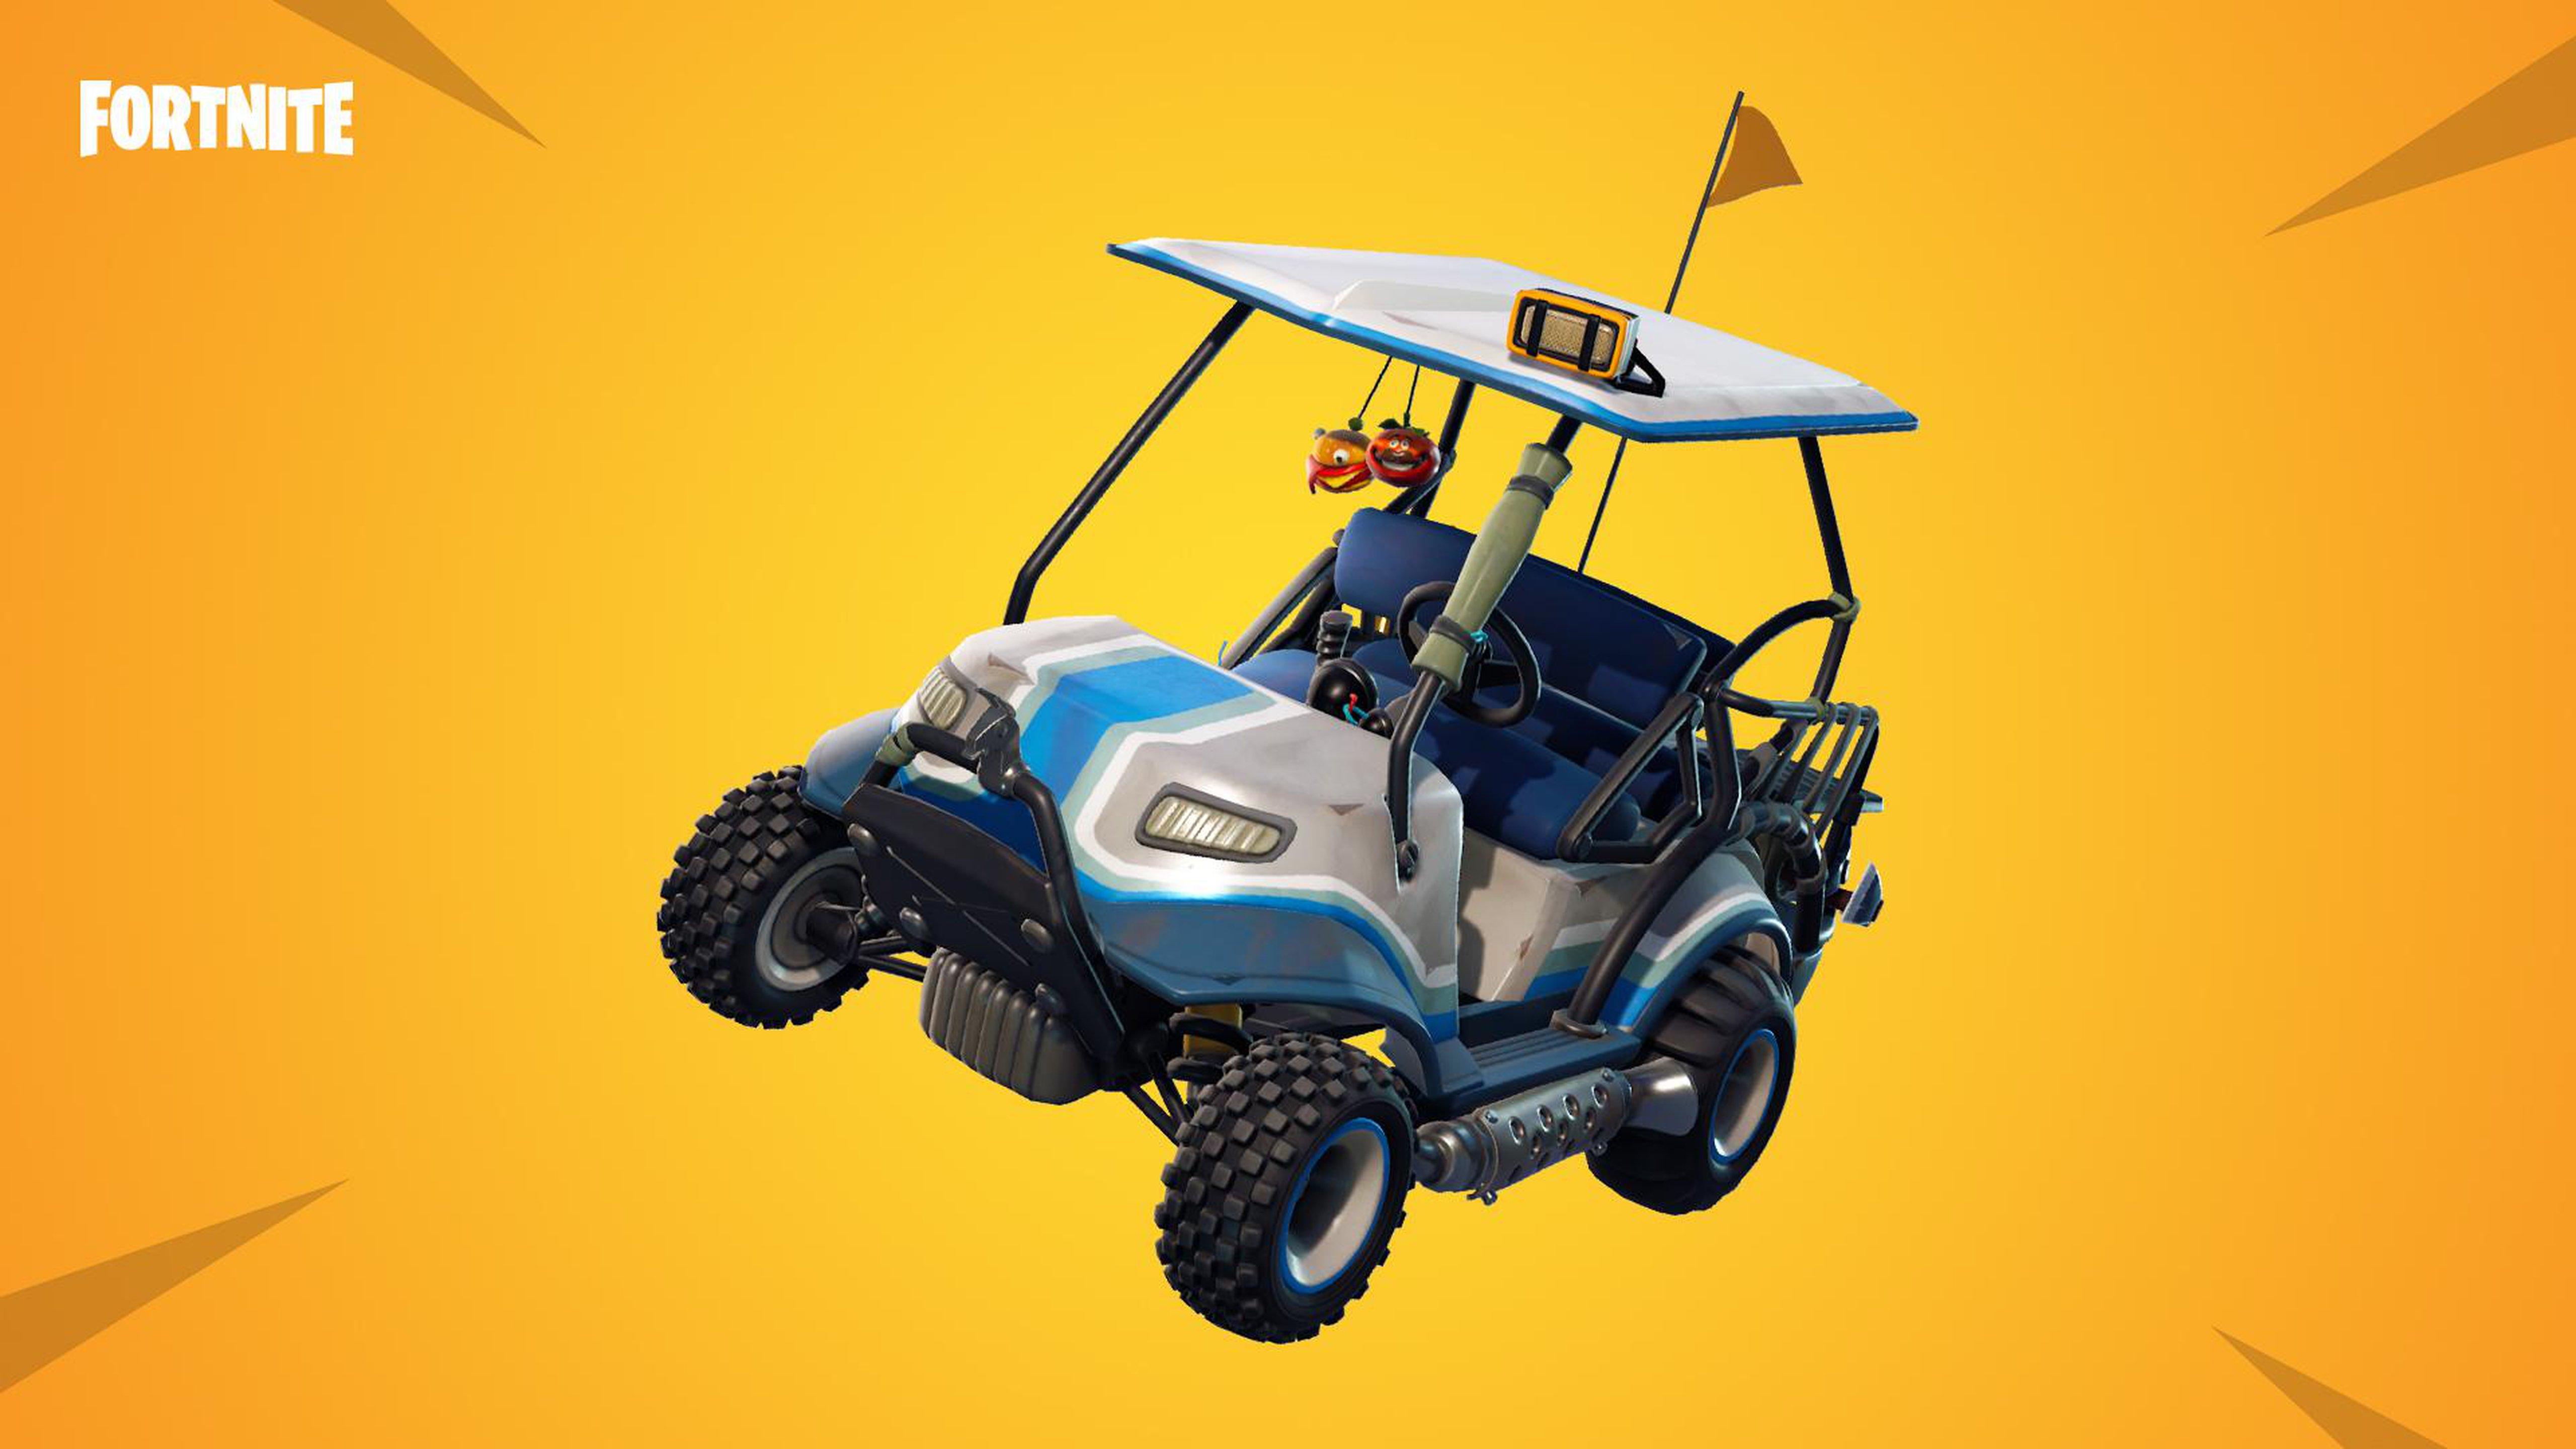 fortnite all terrain kart widescreen wallpaper background 64420